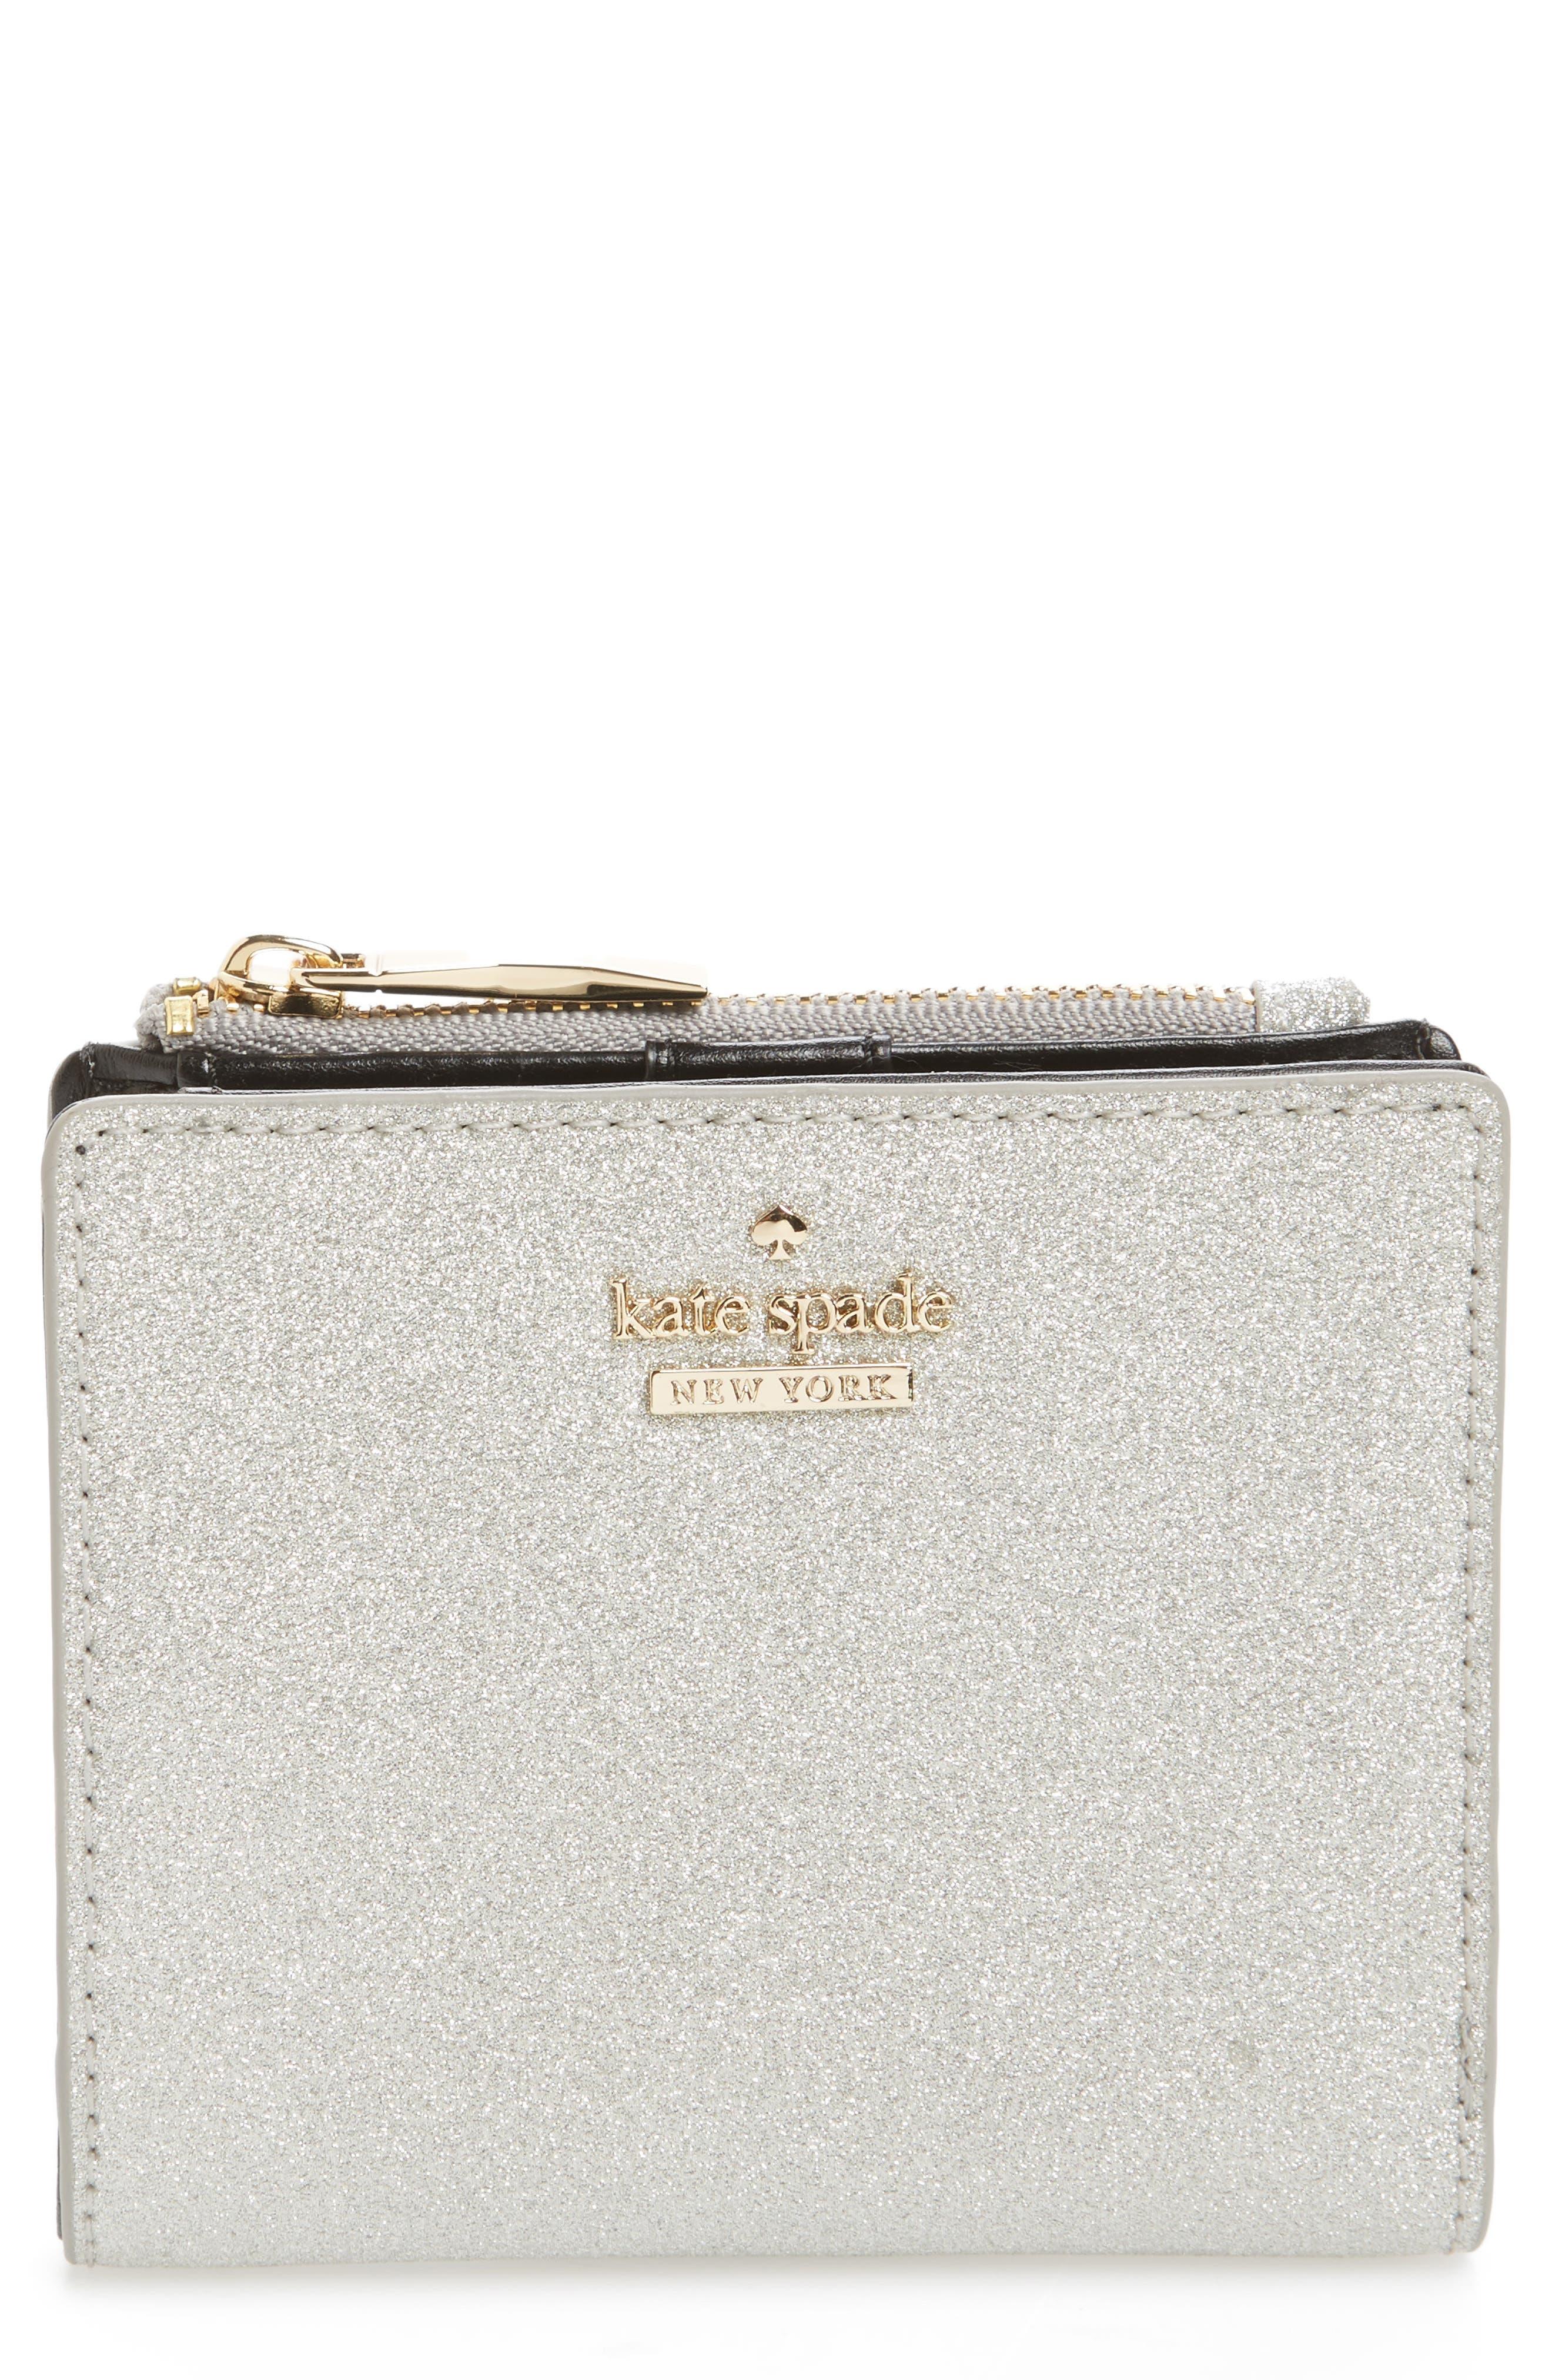 burgess court - adalyn wallet,                         Main,                         color, 040